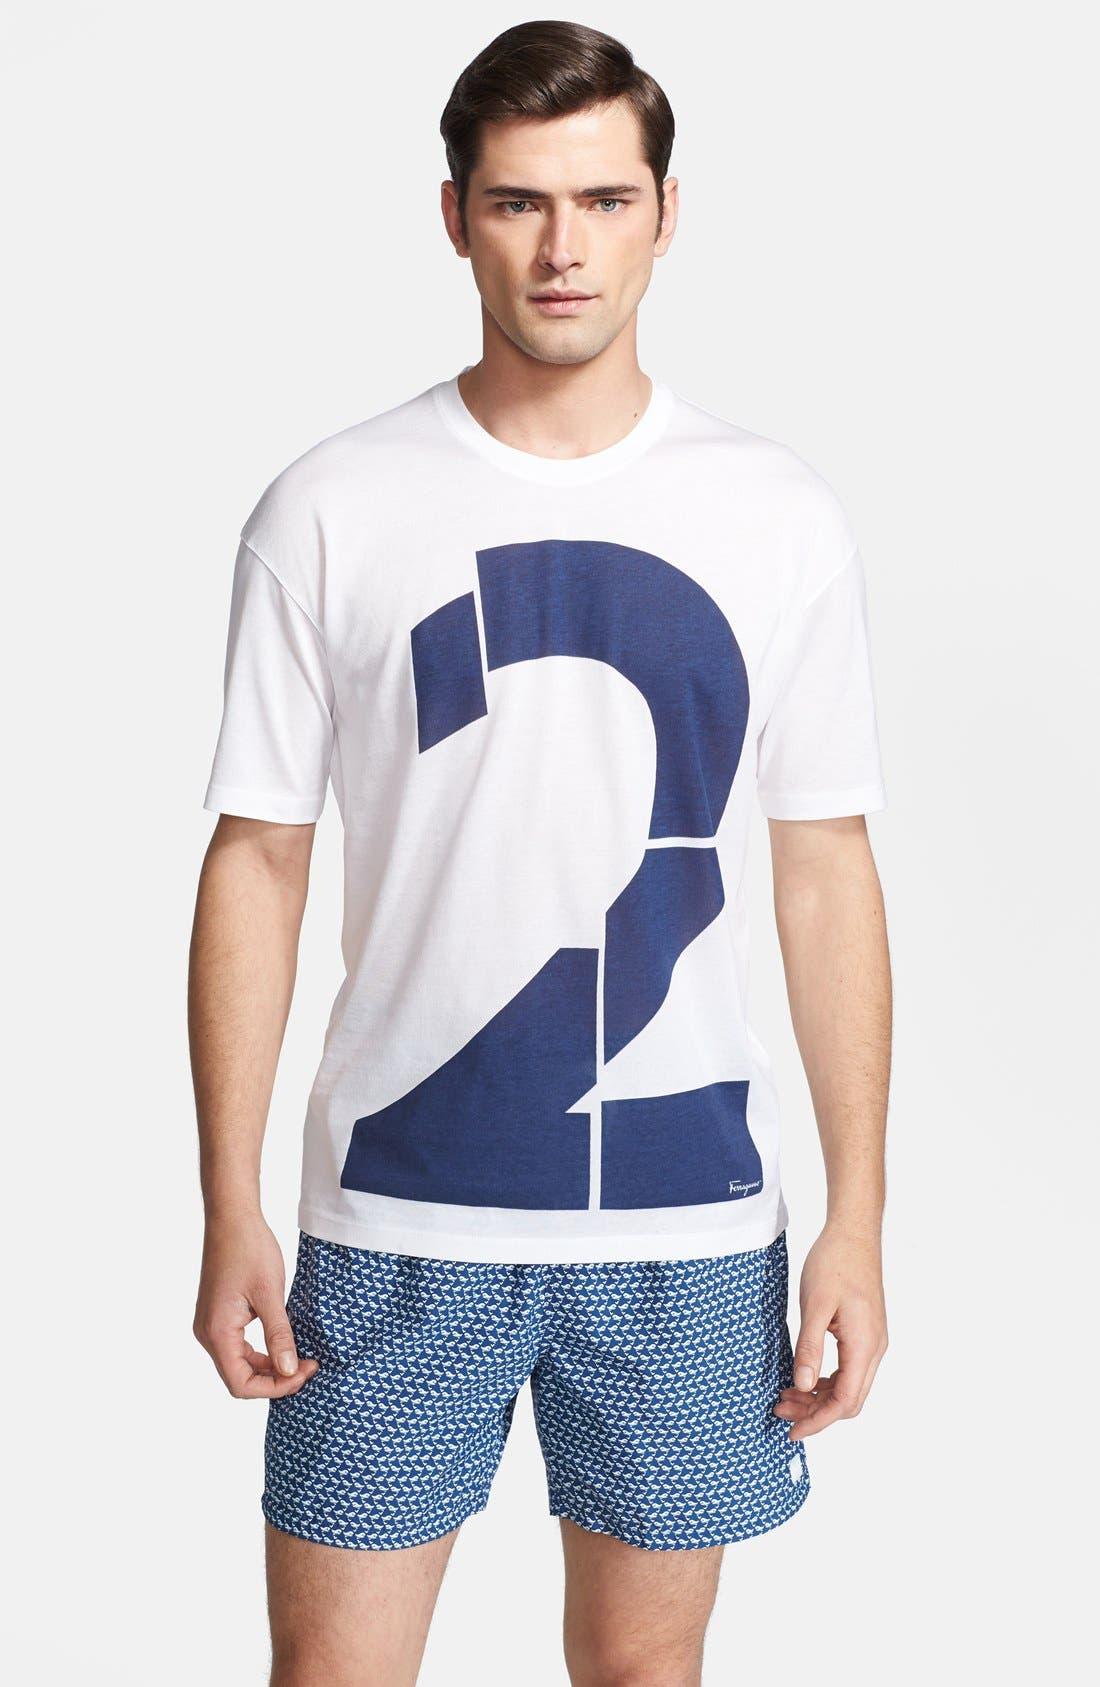 Main Image - Salvatore Ferragamo 'Number 2' Crewneck T-Shirt